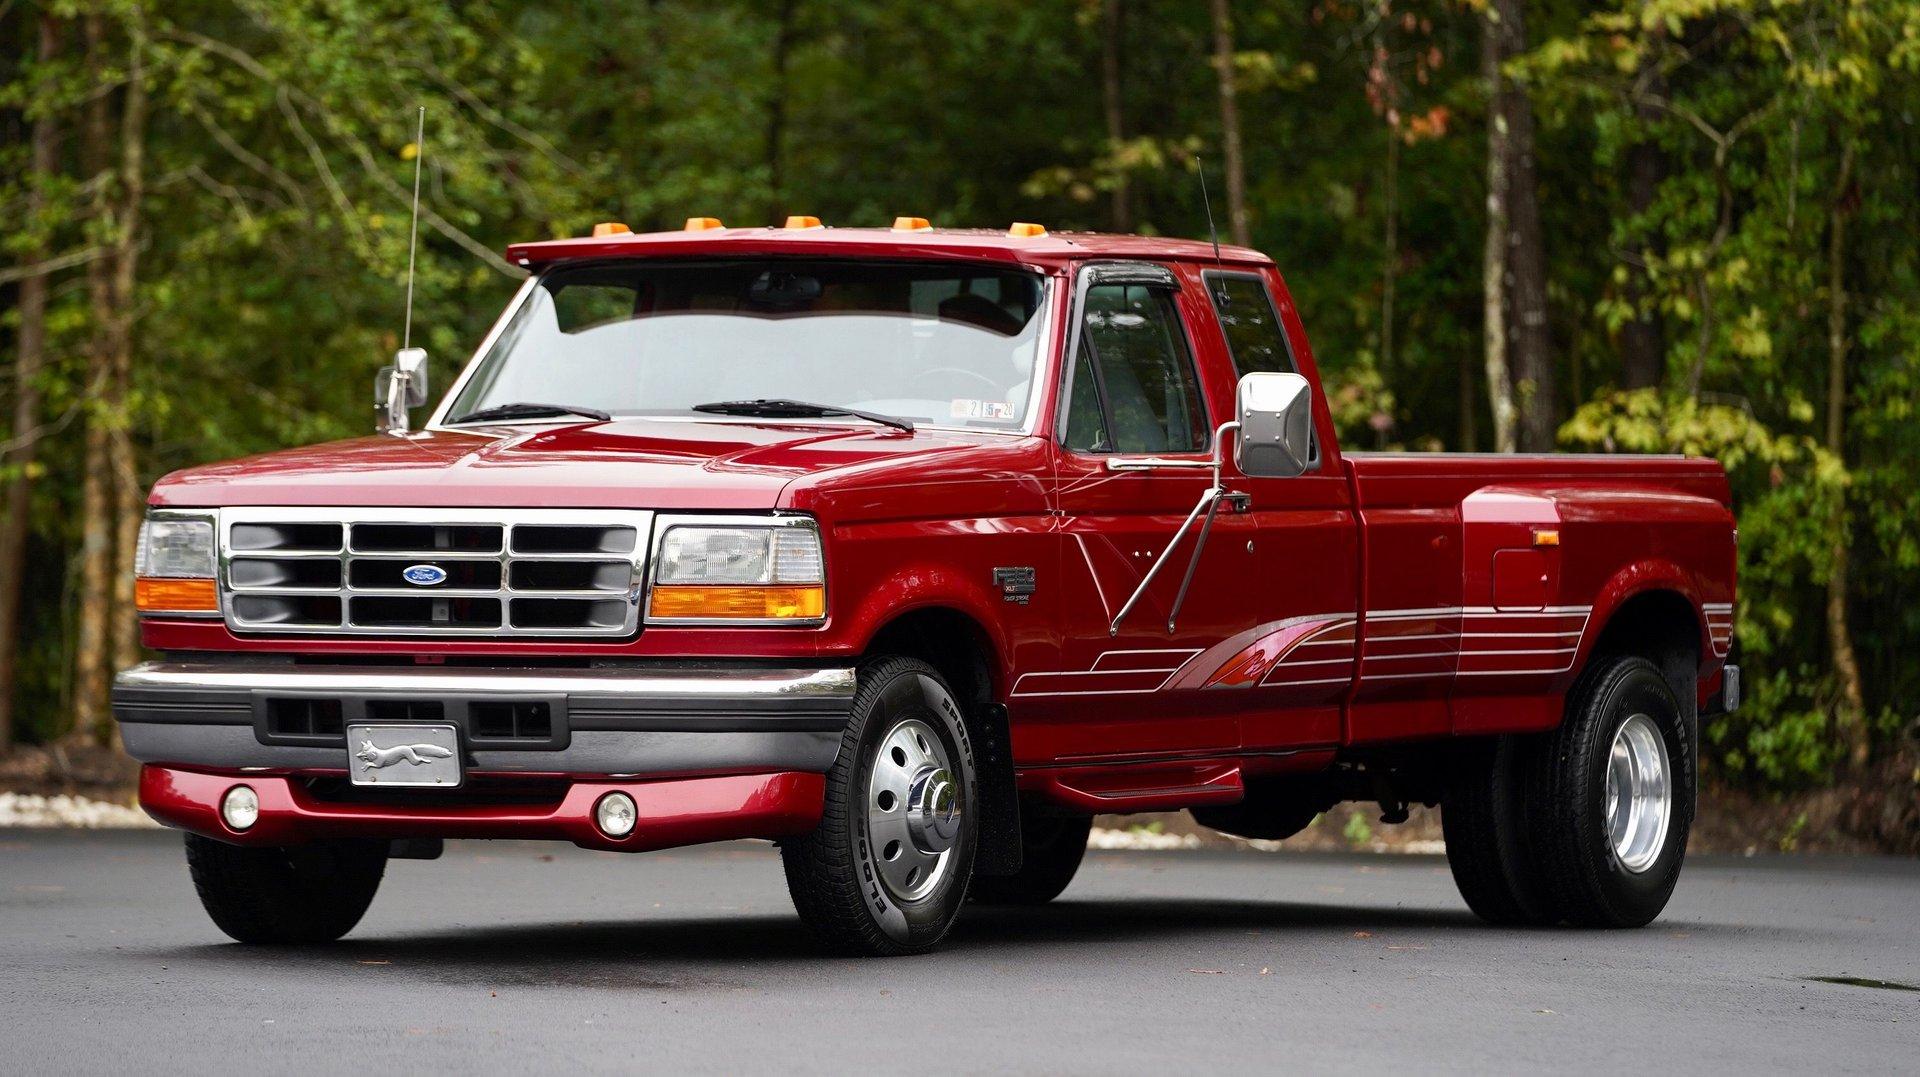 1995 ford f 350 7 3 diesel